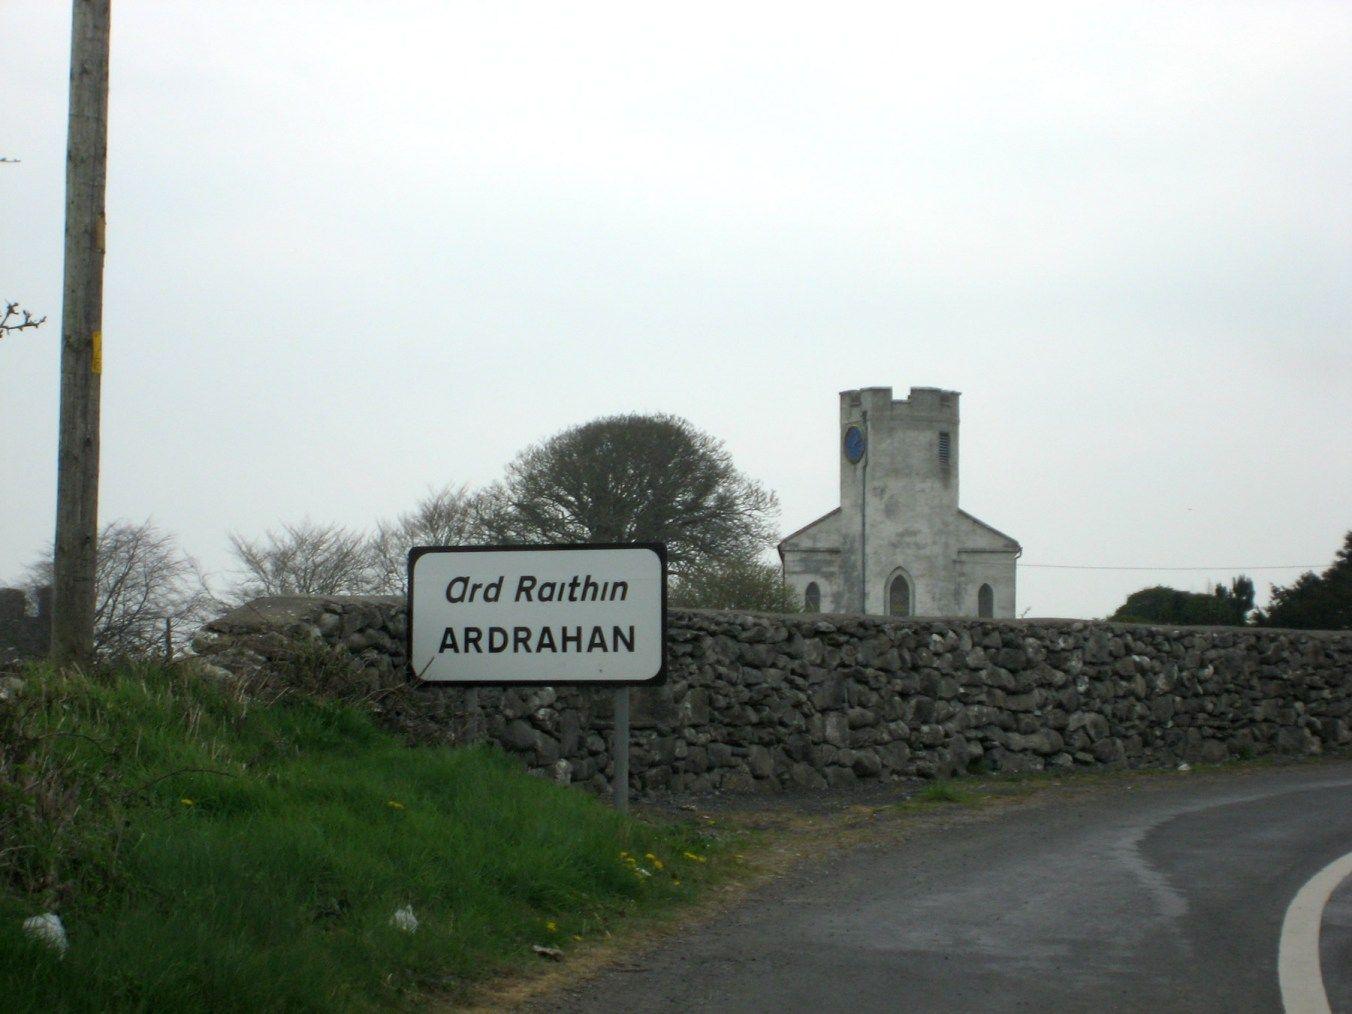 Ardrahan Church, County Galway, Ireland